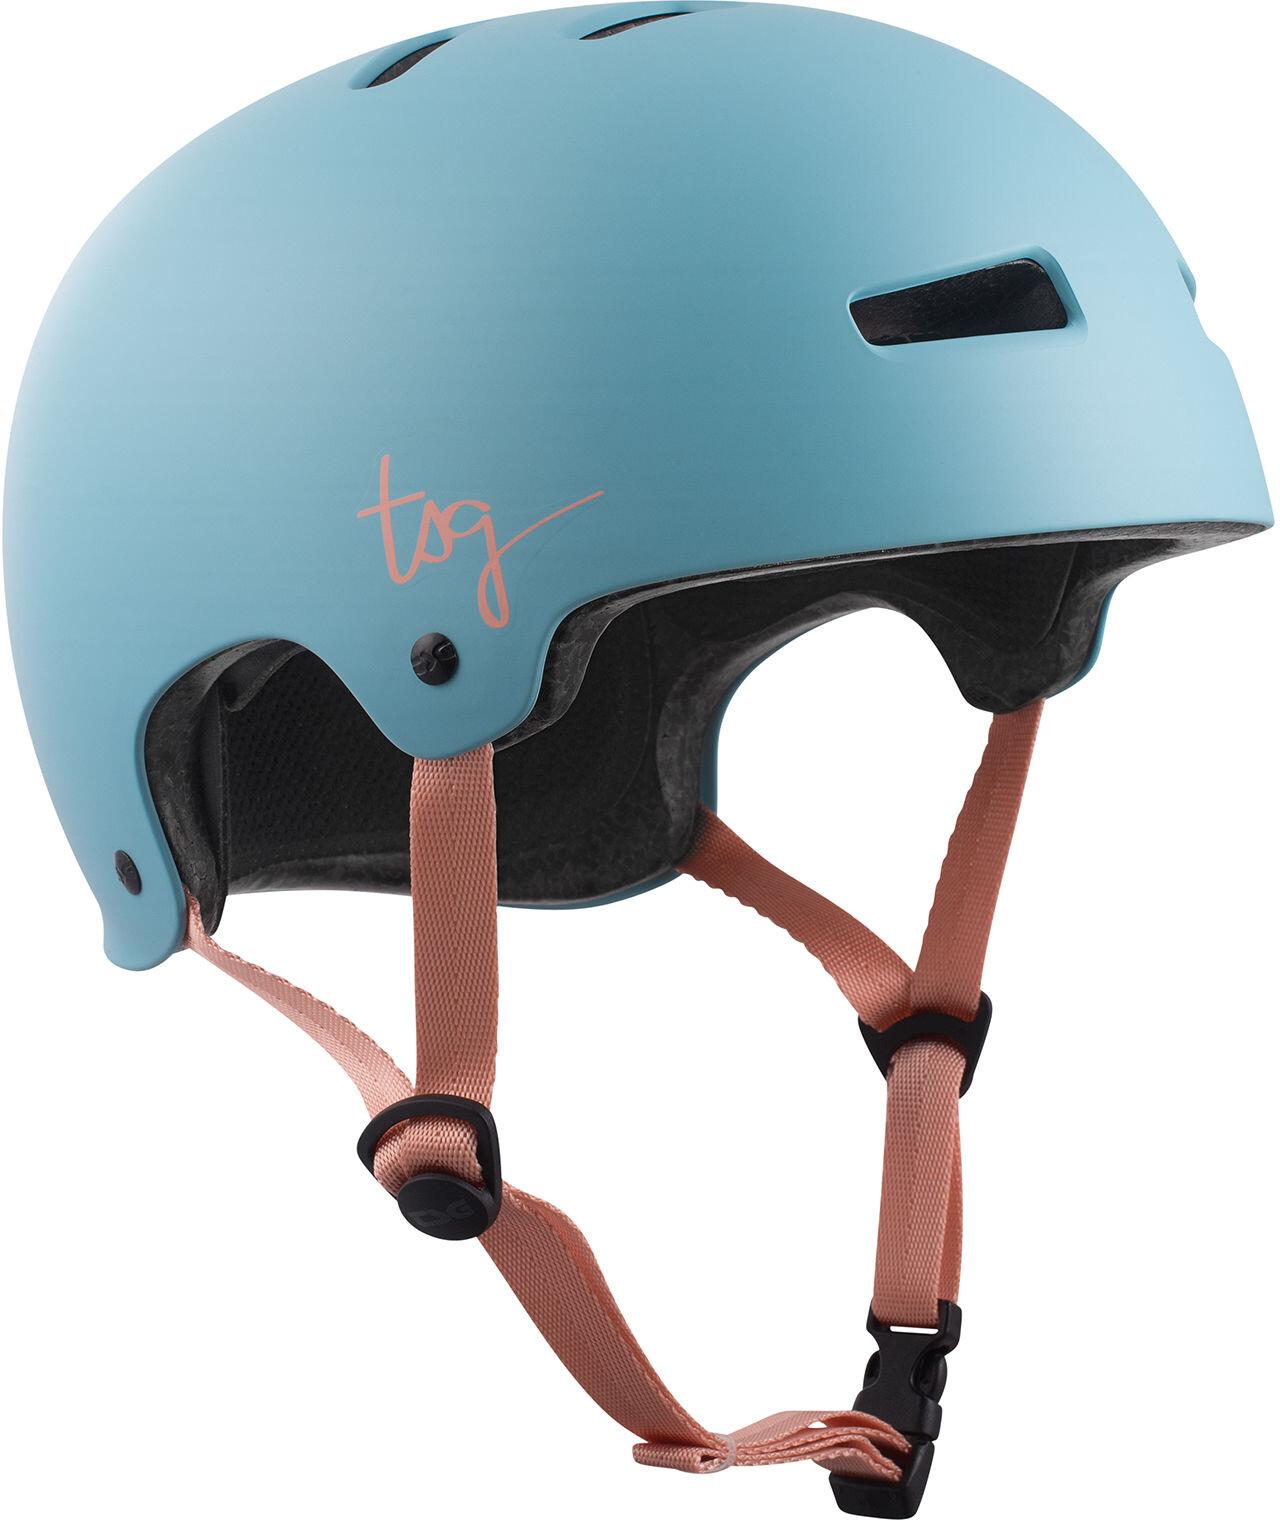 TSG Evolution Solid Color Cykelhjelm Damer, satin porcelain blue | Hjelme